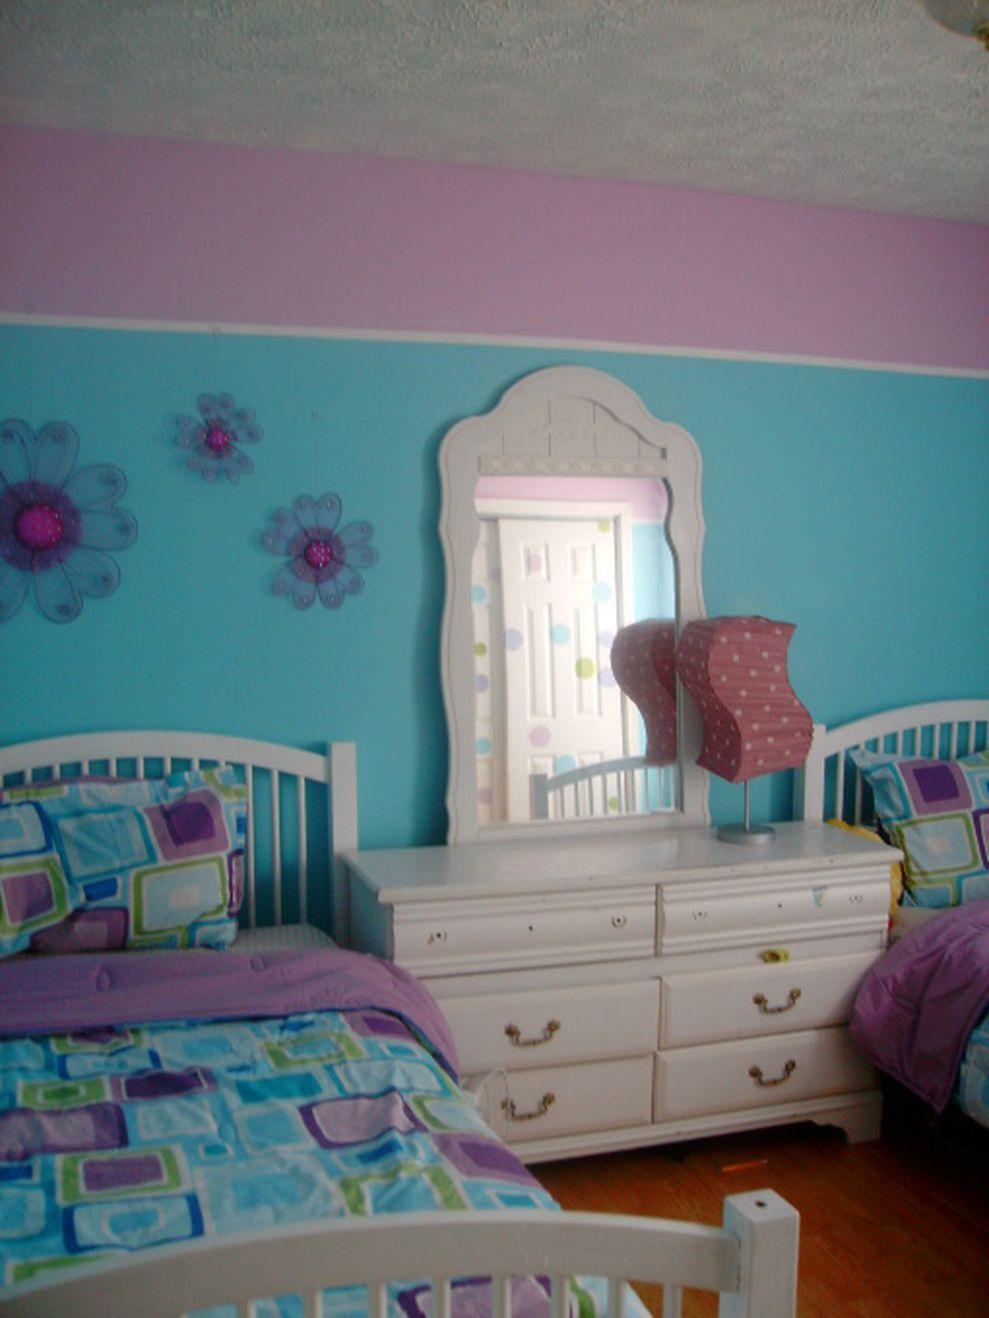 80 Cute Bedroom Design Ideas Pink Green Walls Home Decor Girls Turquoise Tween Girl Room